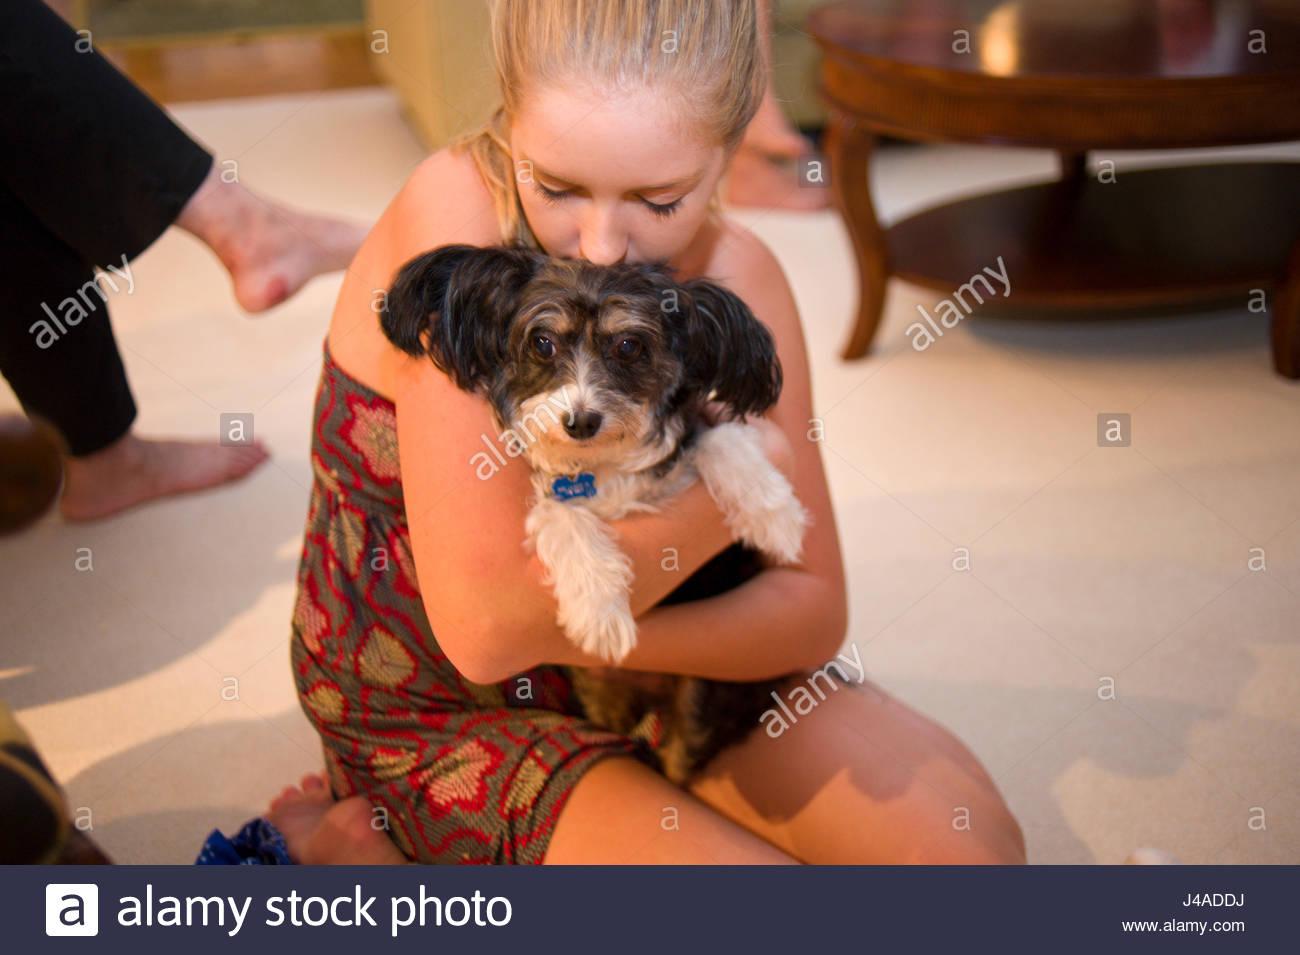 Teenage girl holding small pet dog at home, USA Stock Photo